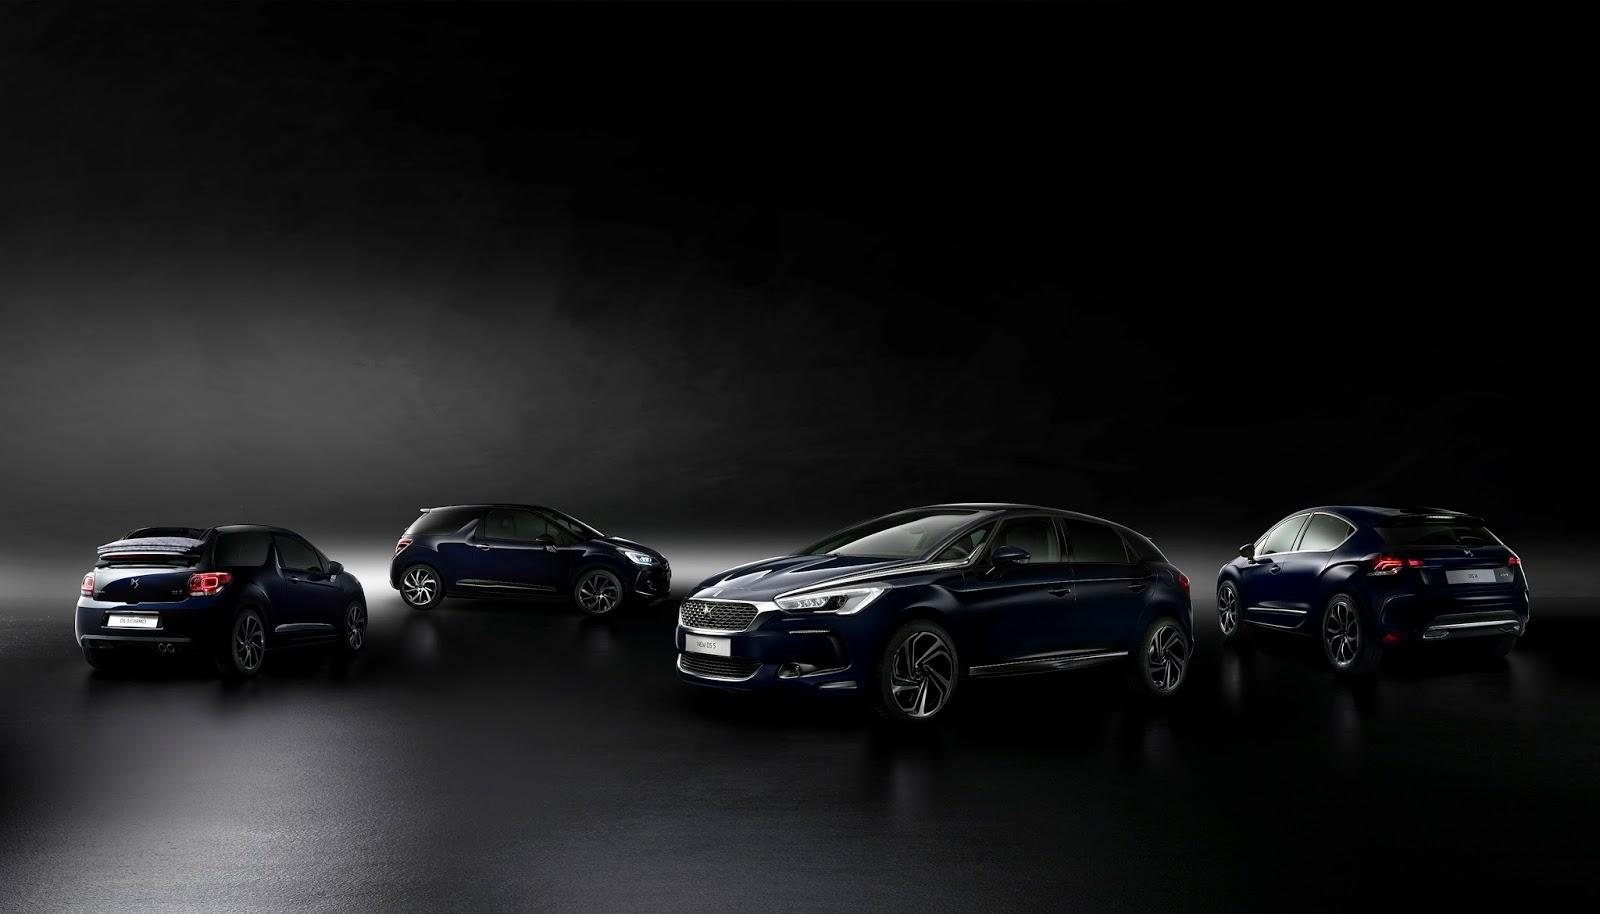 DS%2BAutomobiles Range Το DS 4 Crossback κάνει πρεμιέρα στην Ελλαδα στην αυτοκίνηση 2015 DS, DS 4 Crossback, DS Automobiles, videos, ΑΥΤΟΚΙΝΗΣΗ 2015